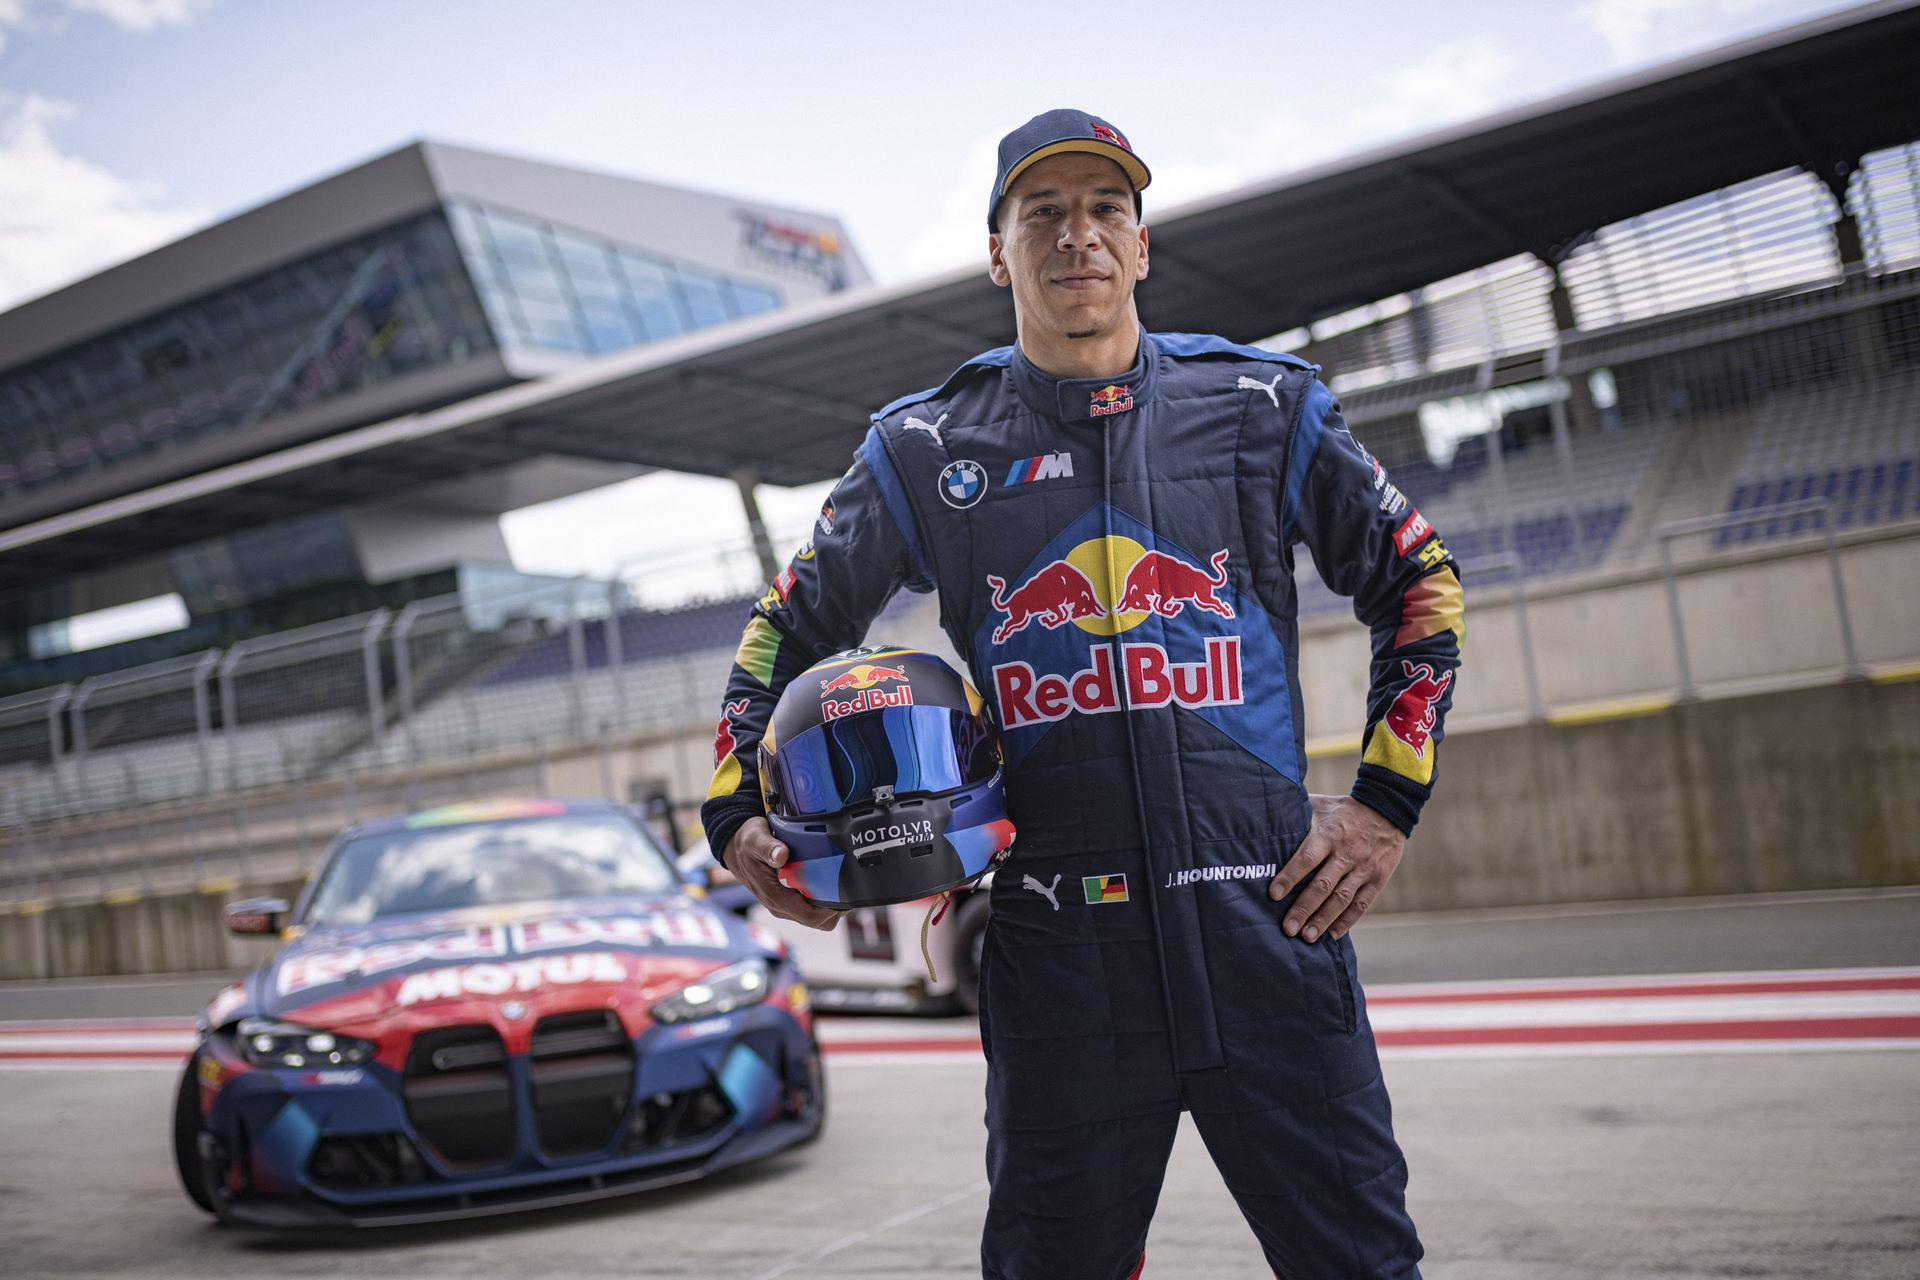 BMW-M4-Red-Bull-Driftbrothers-12